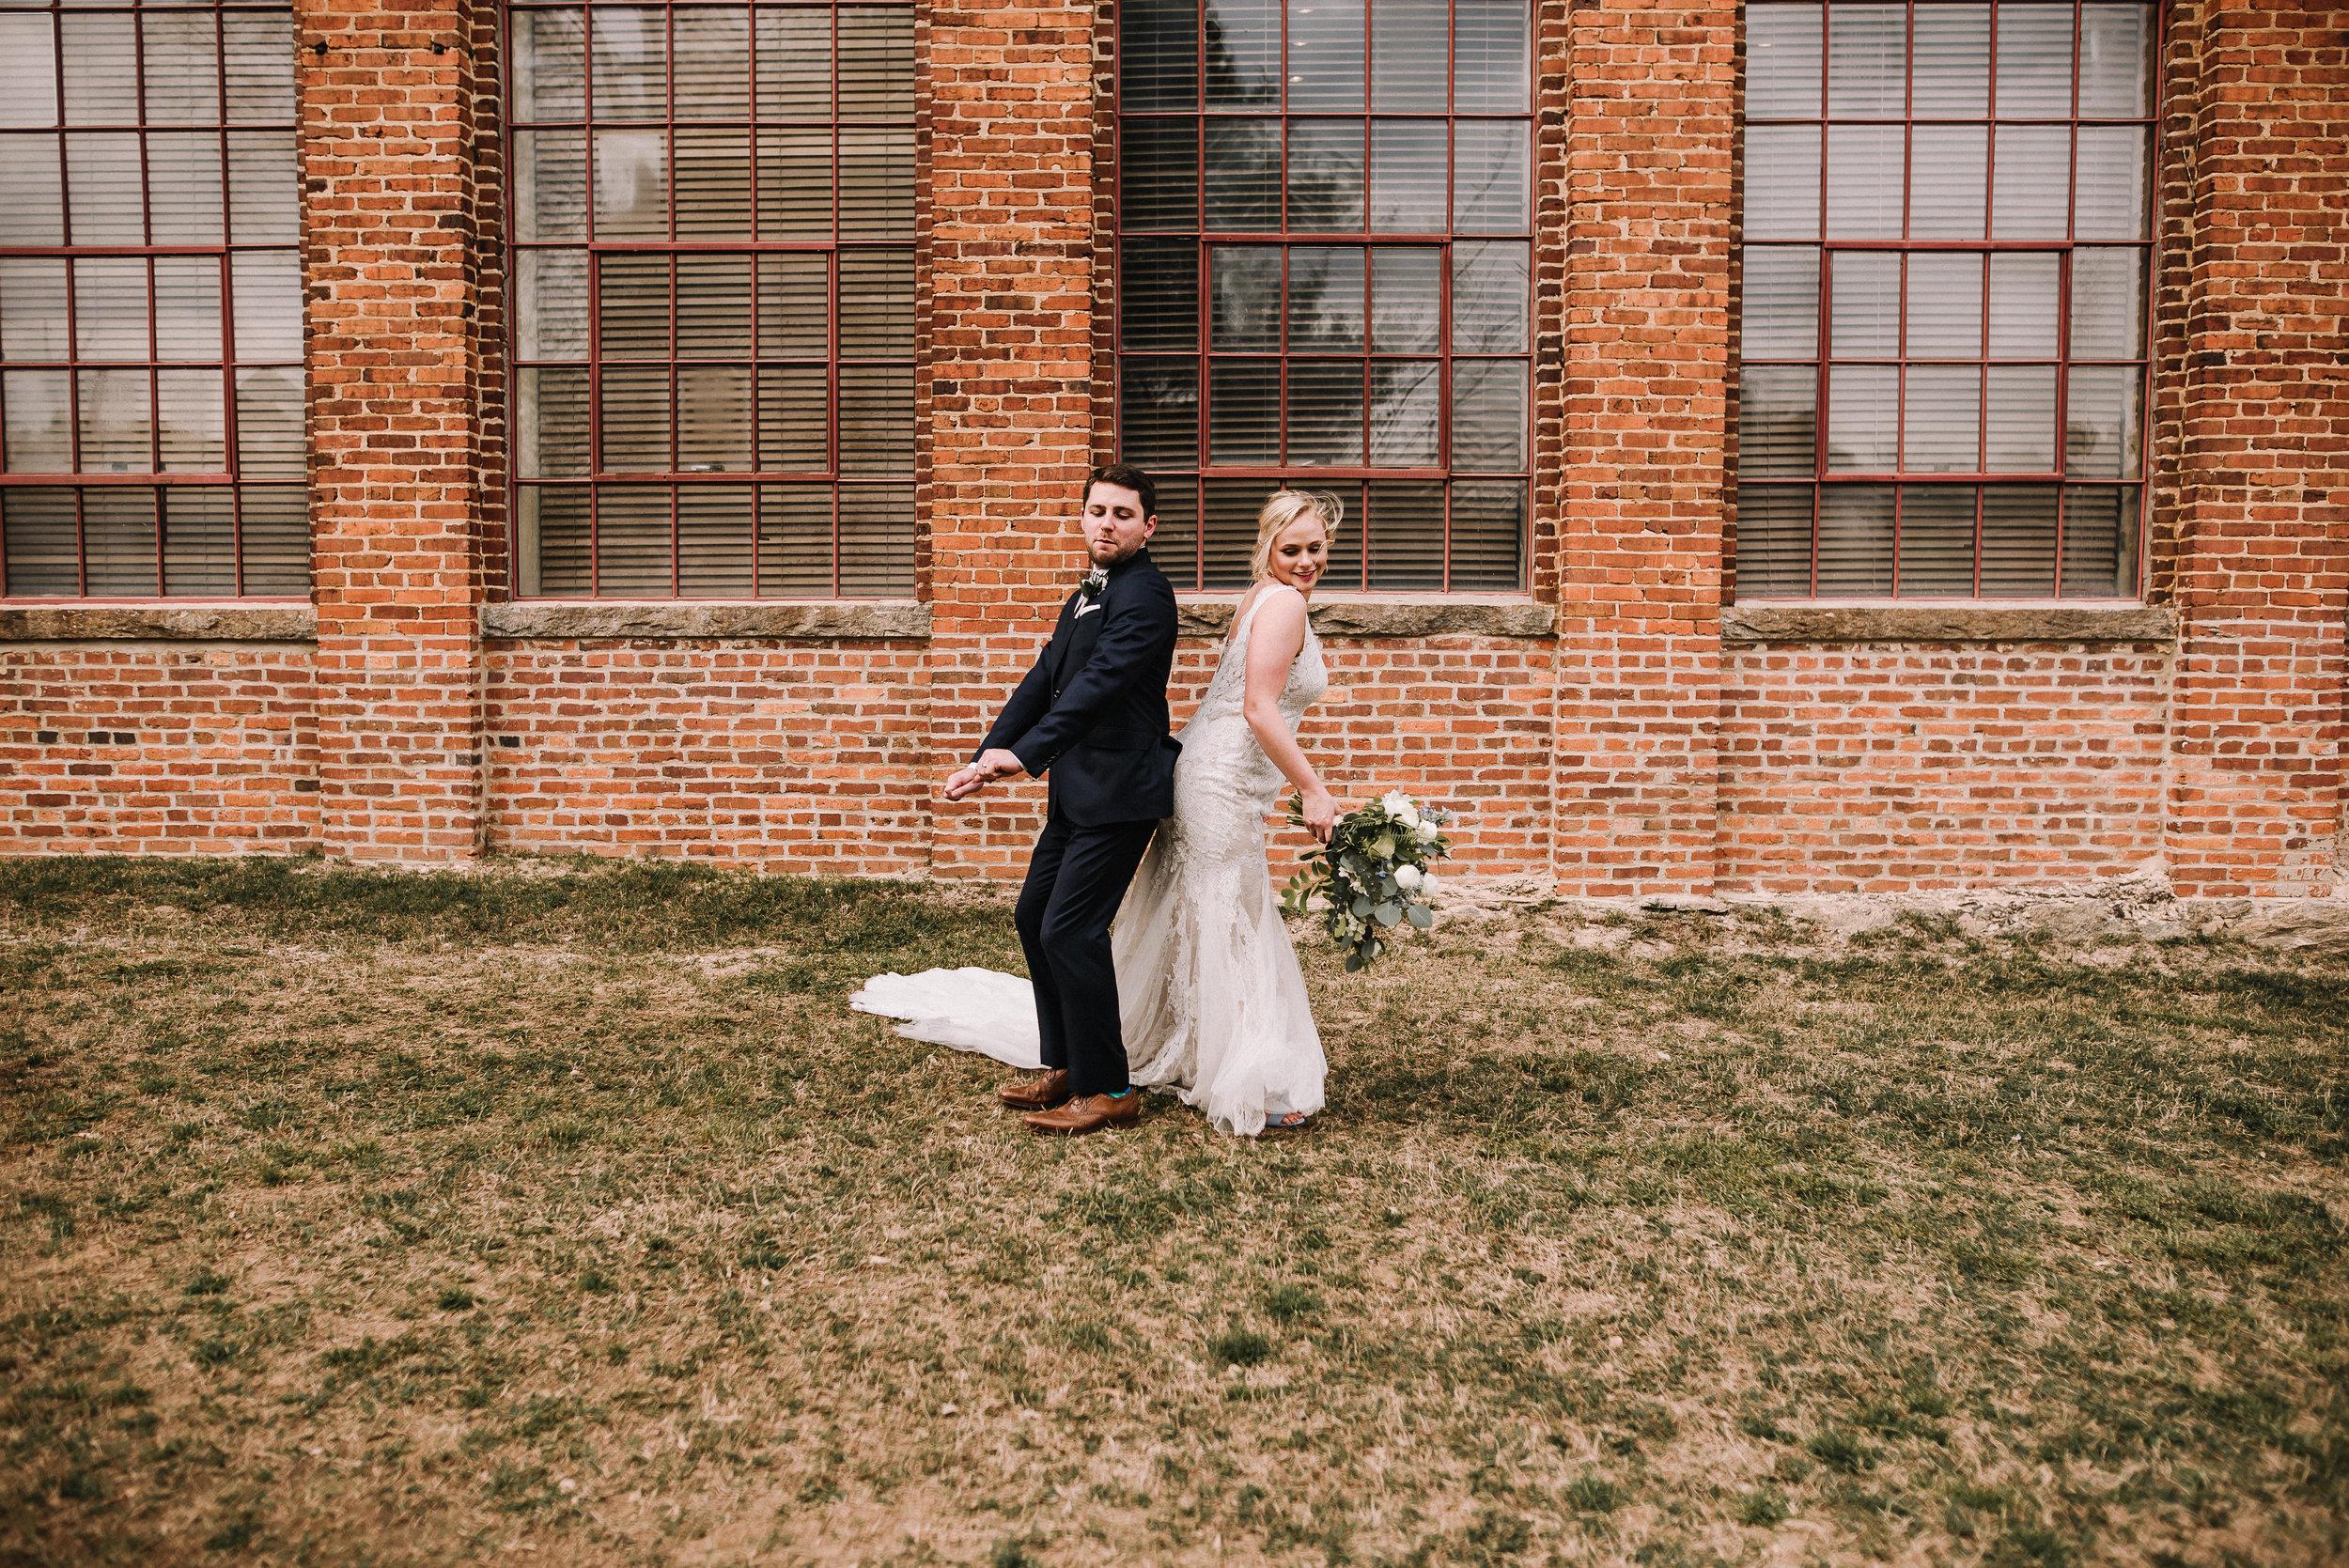 Morgan Wedding_Mill at Yellow River_Ashley Benham Photography-823.jpg